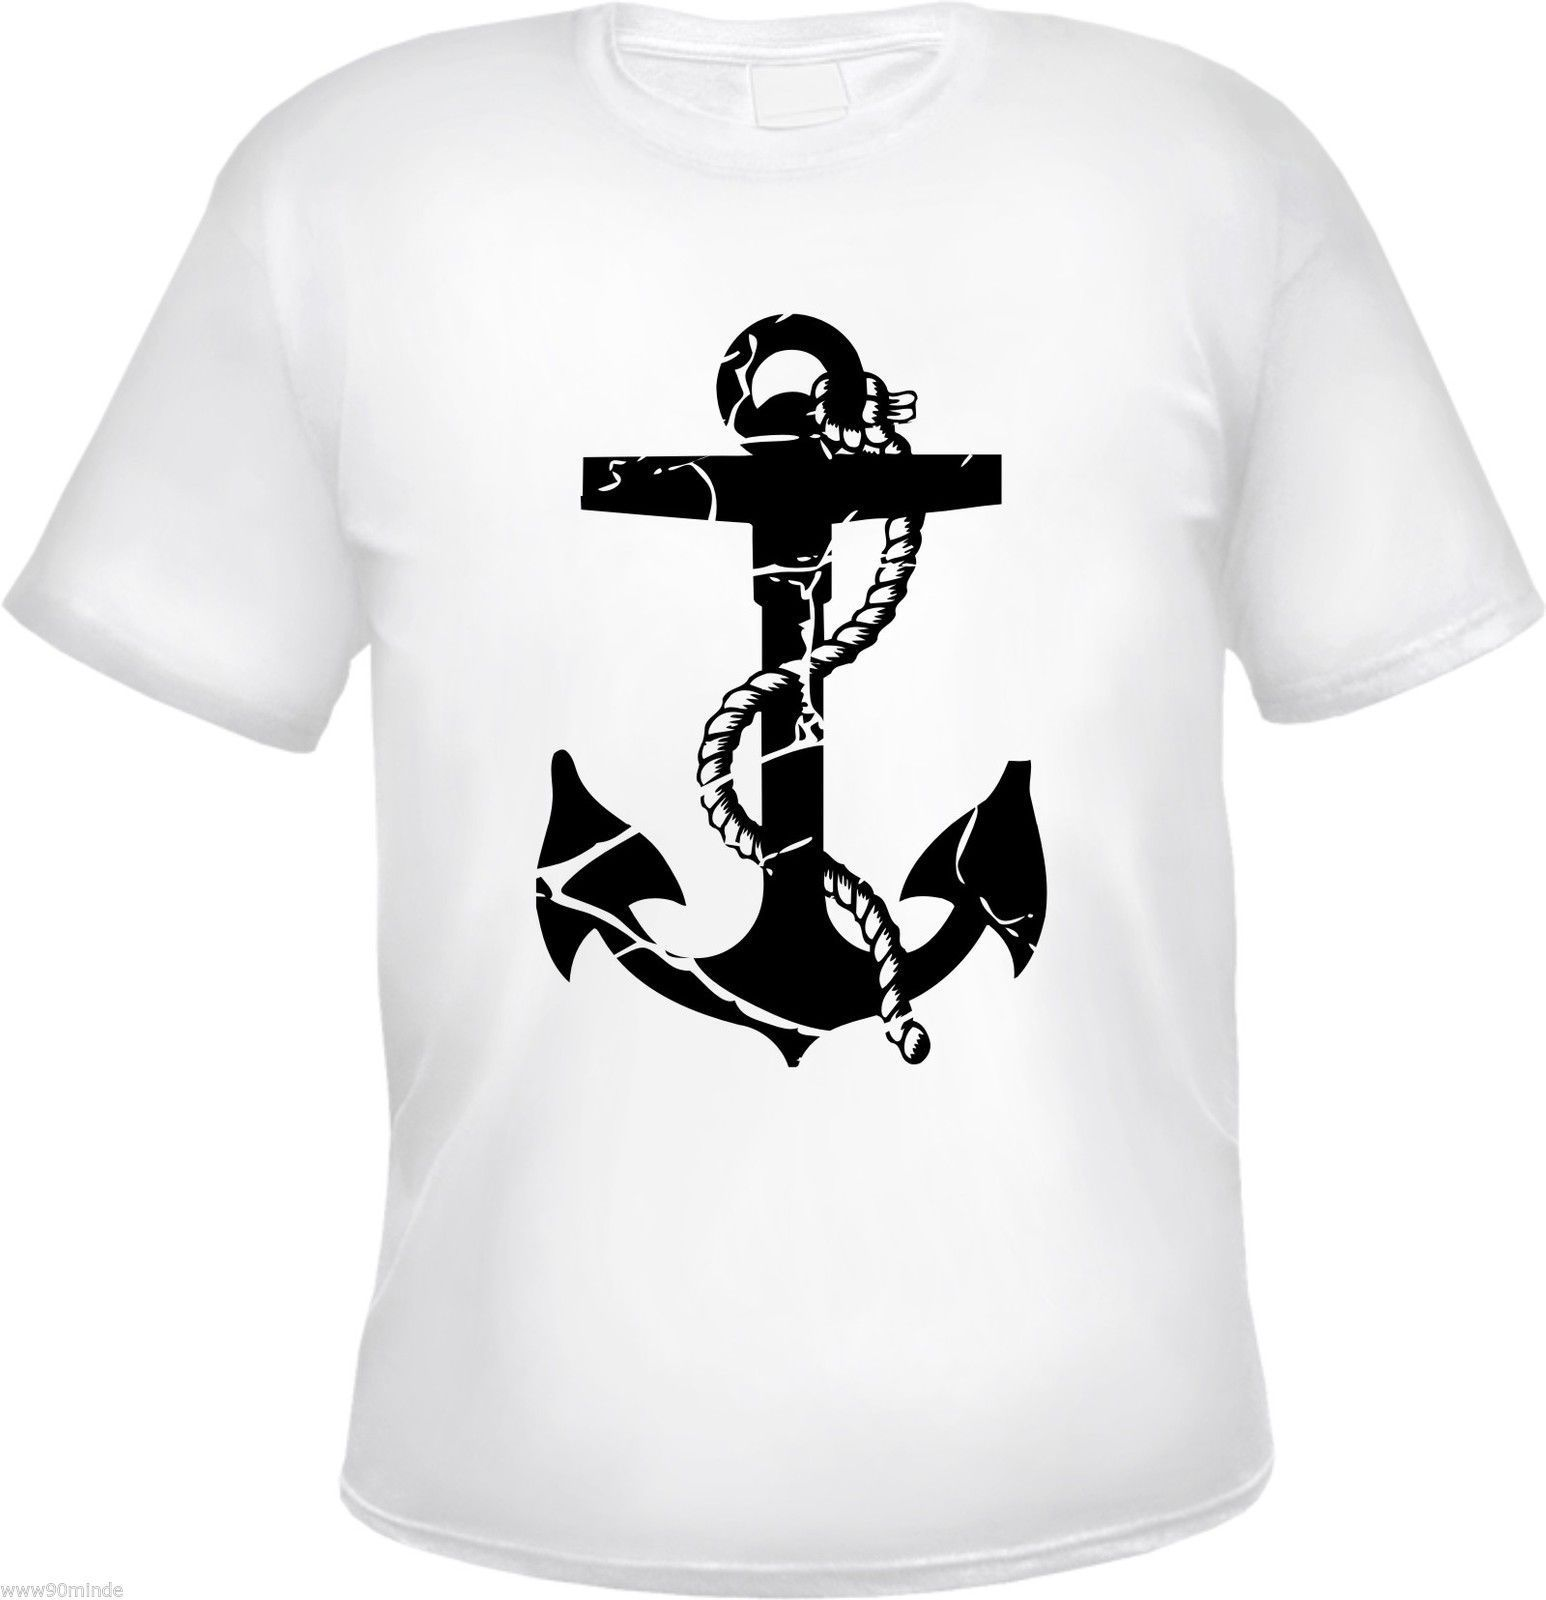 T-Shirt mit ANKER Motiv - WEISS/SCHWARZ - S bis 3XL - rockabilly kapitän anchor